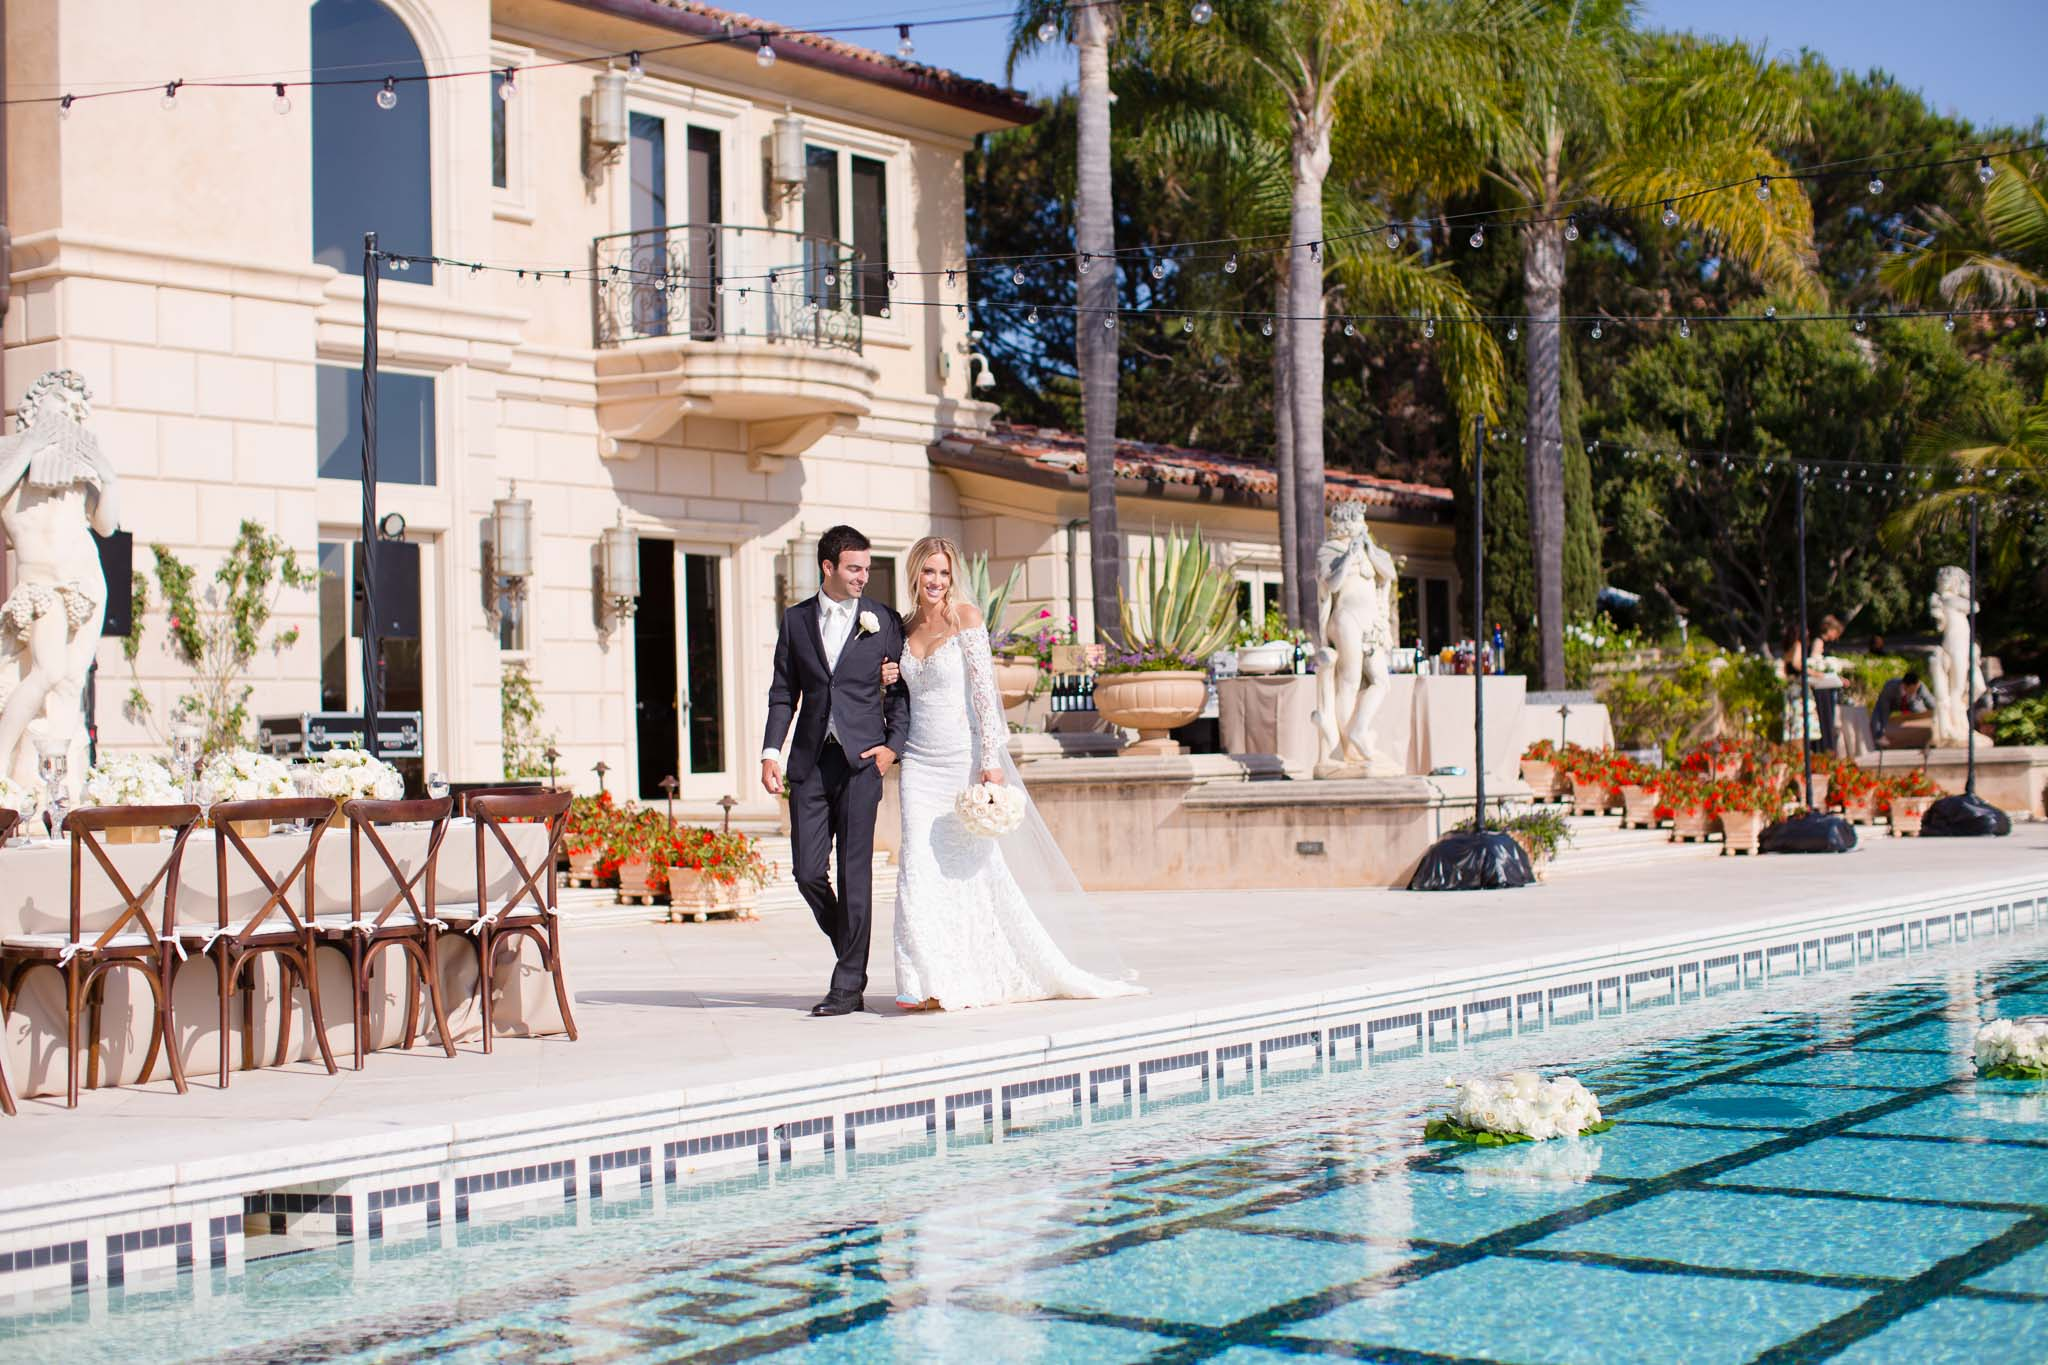 rancho_santa_fe_estate_wedding_071.jpg